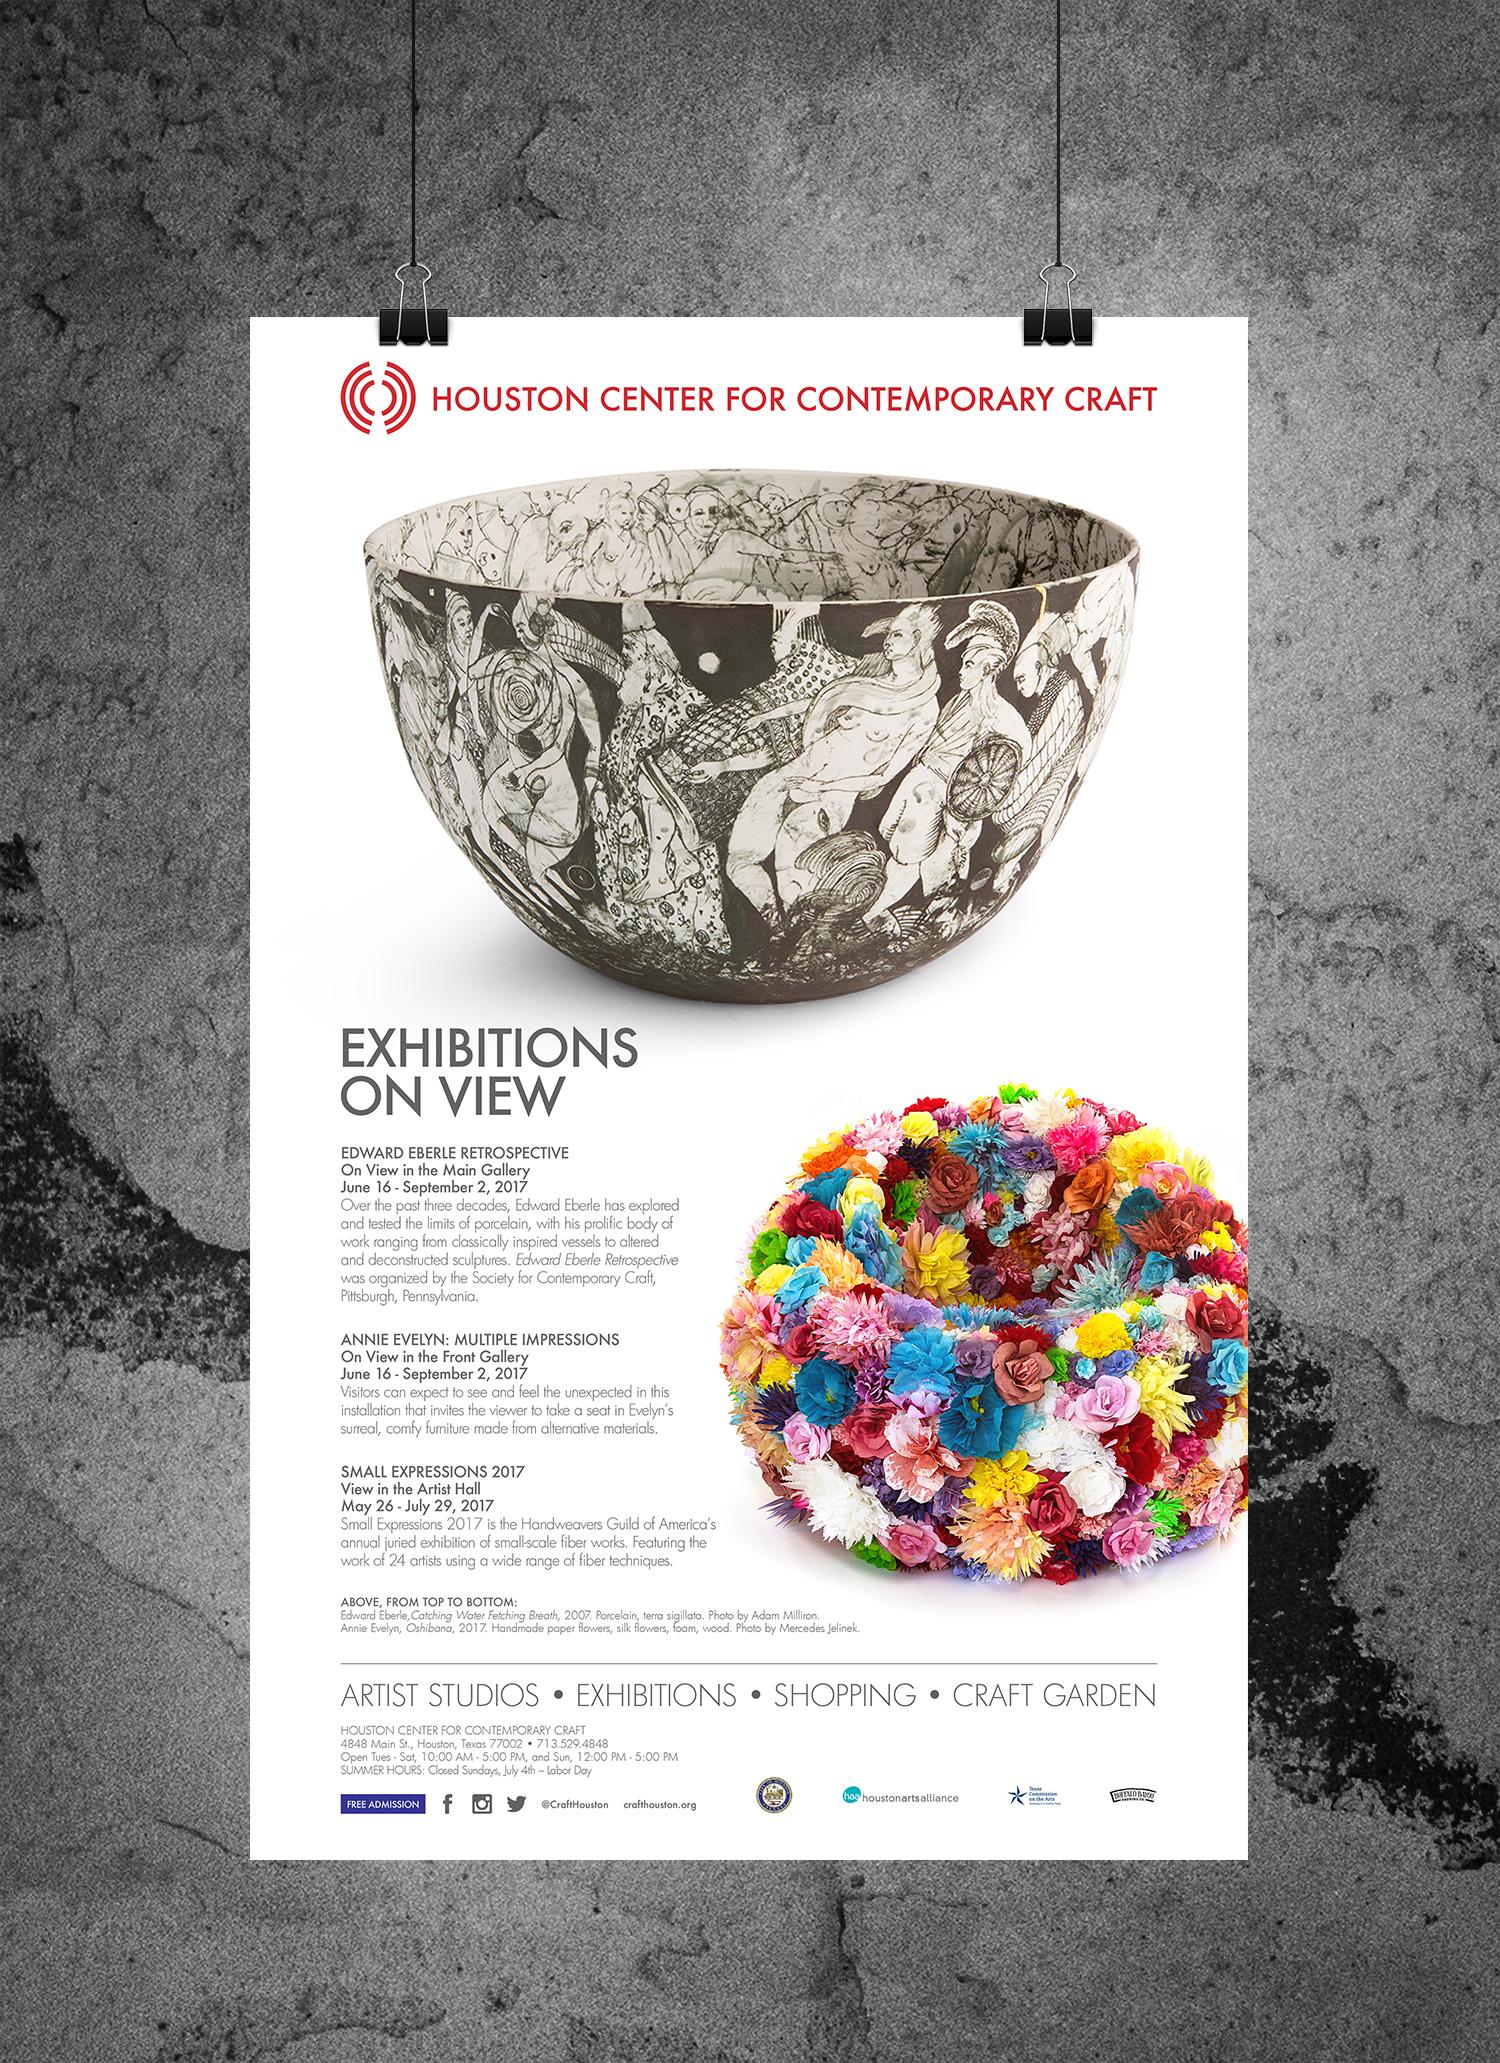 HCCC-Exhibition-Poster-Presentation.jpg